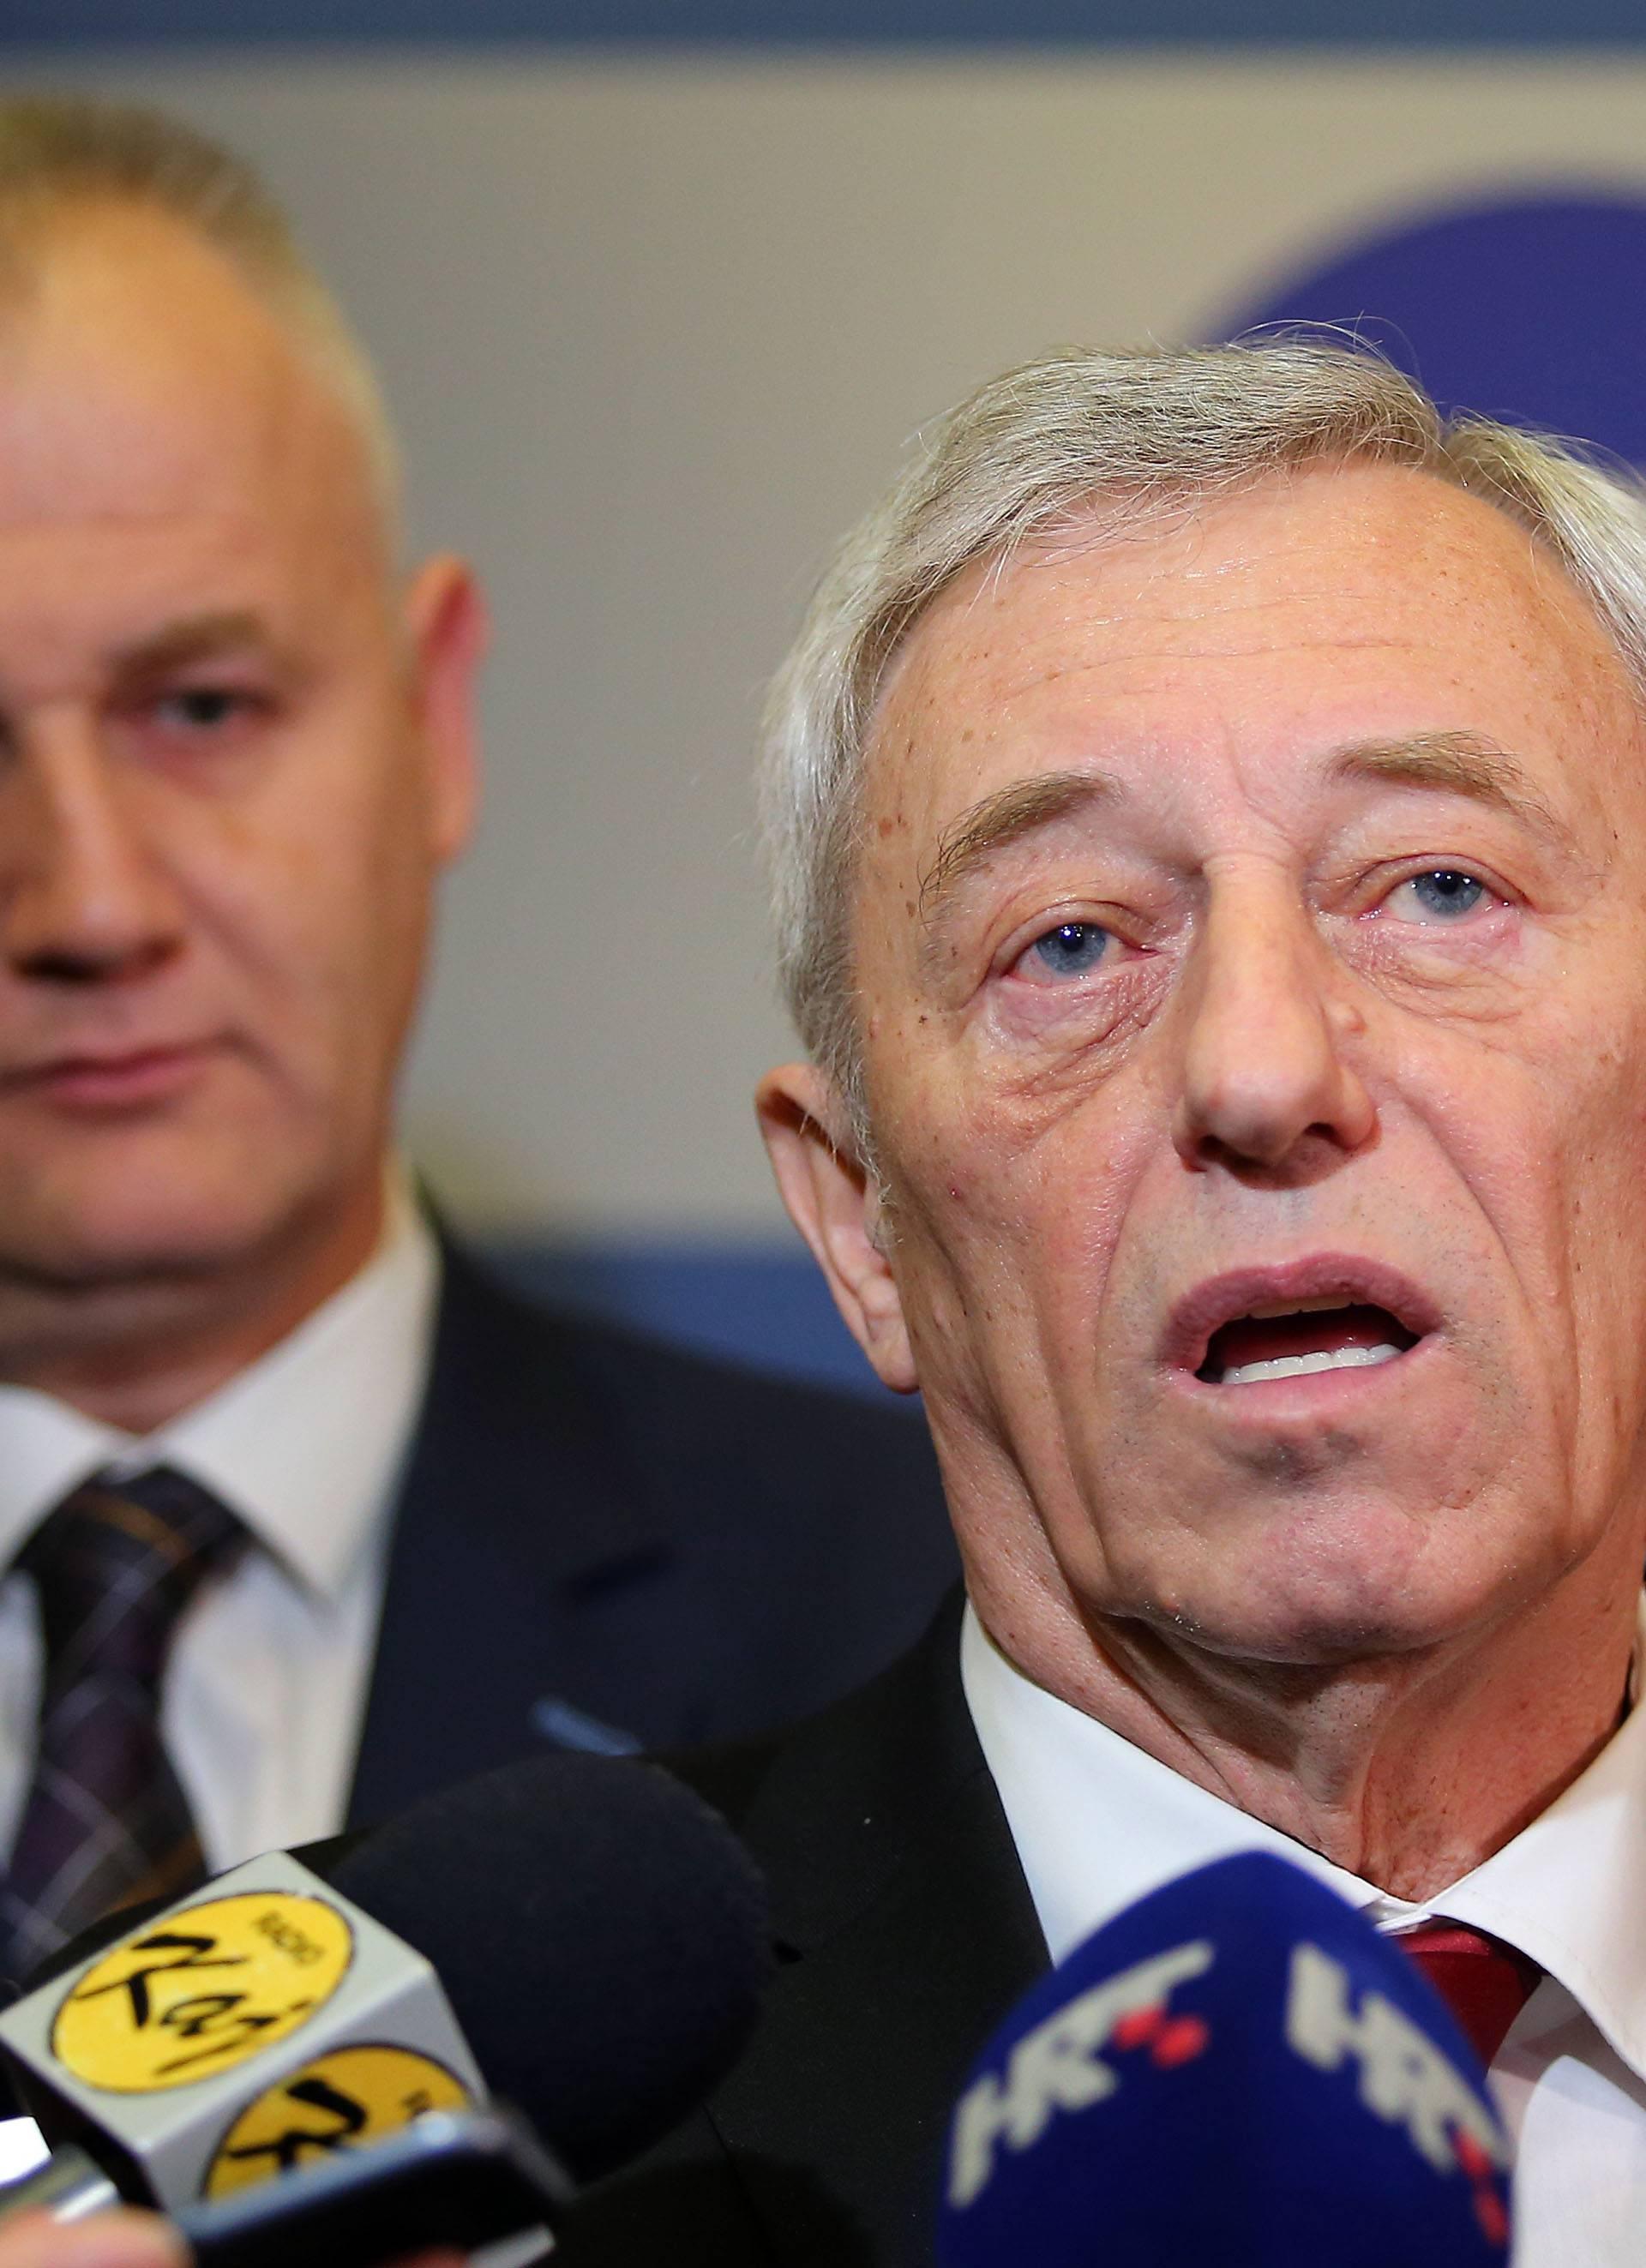 'Župan Kožić i HDZ Zagrebačku županiju vode u kaos i blokadu'